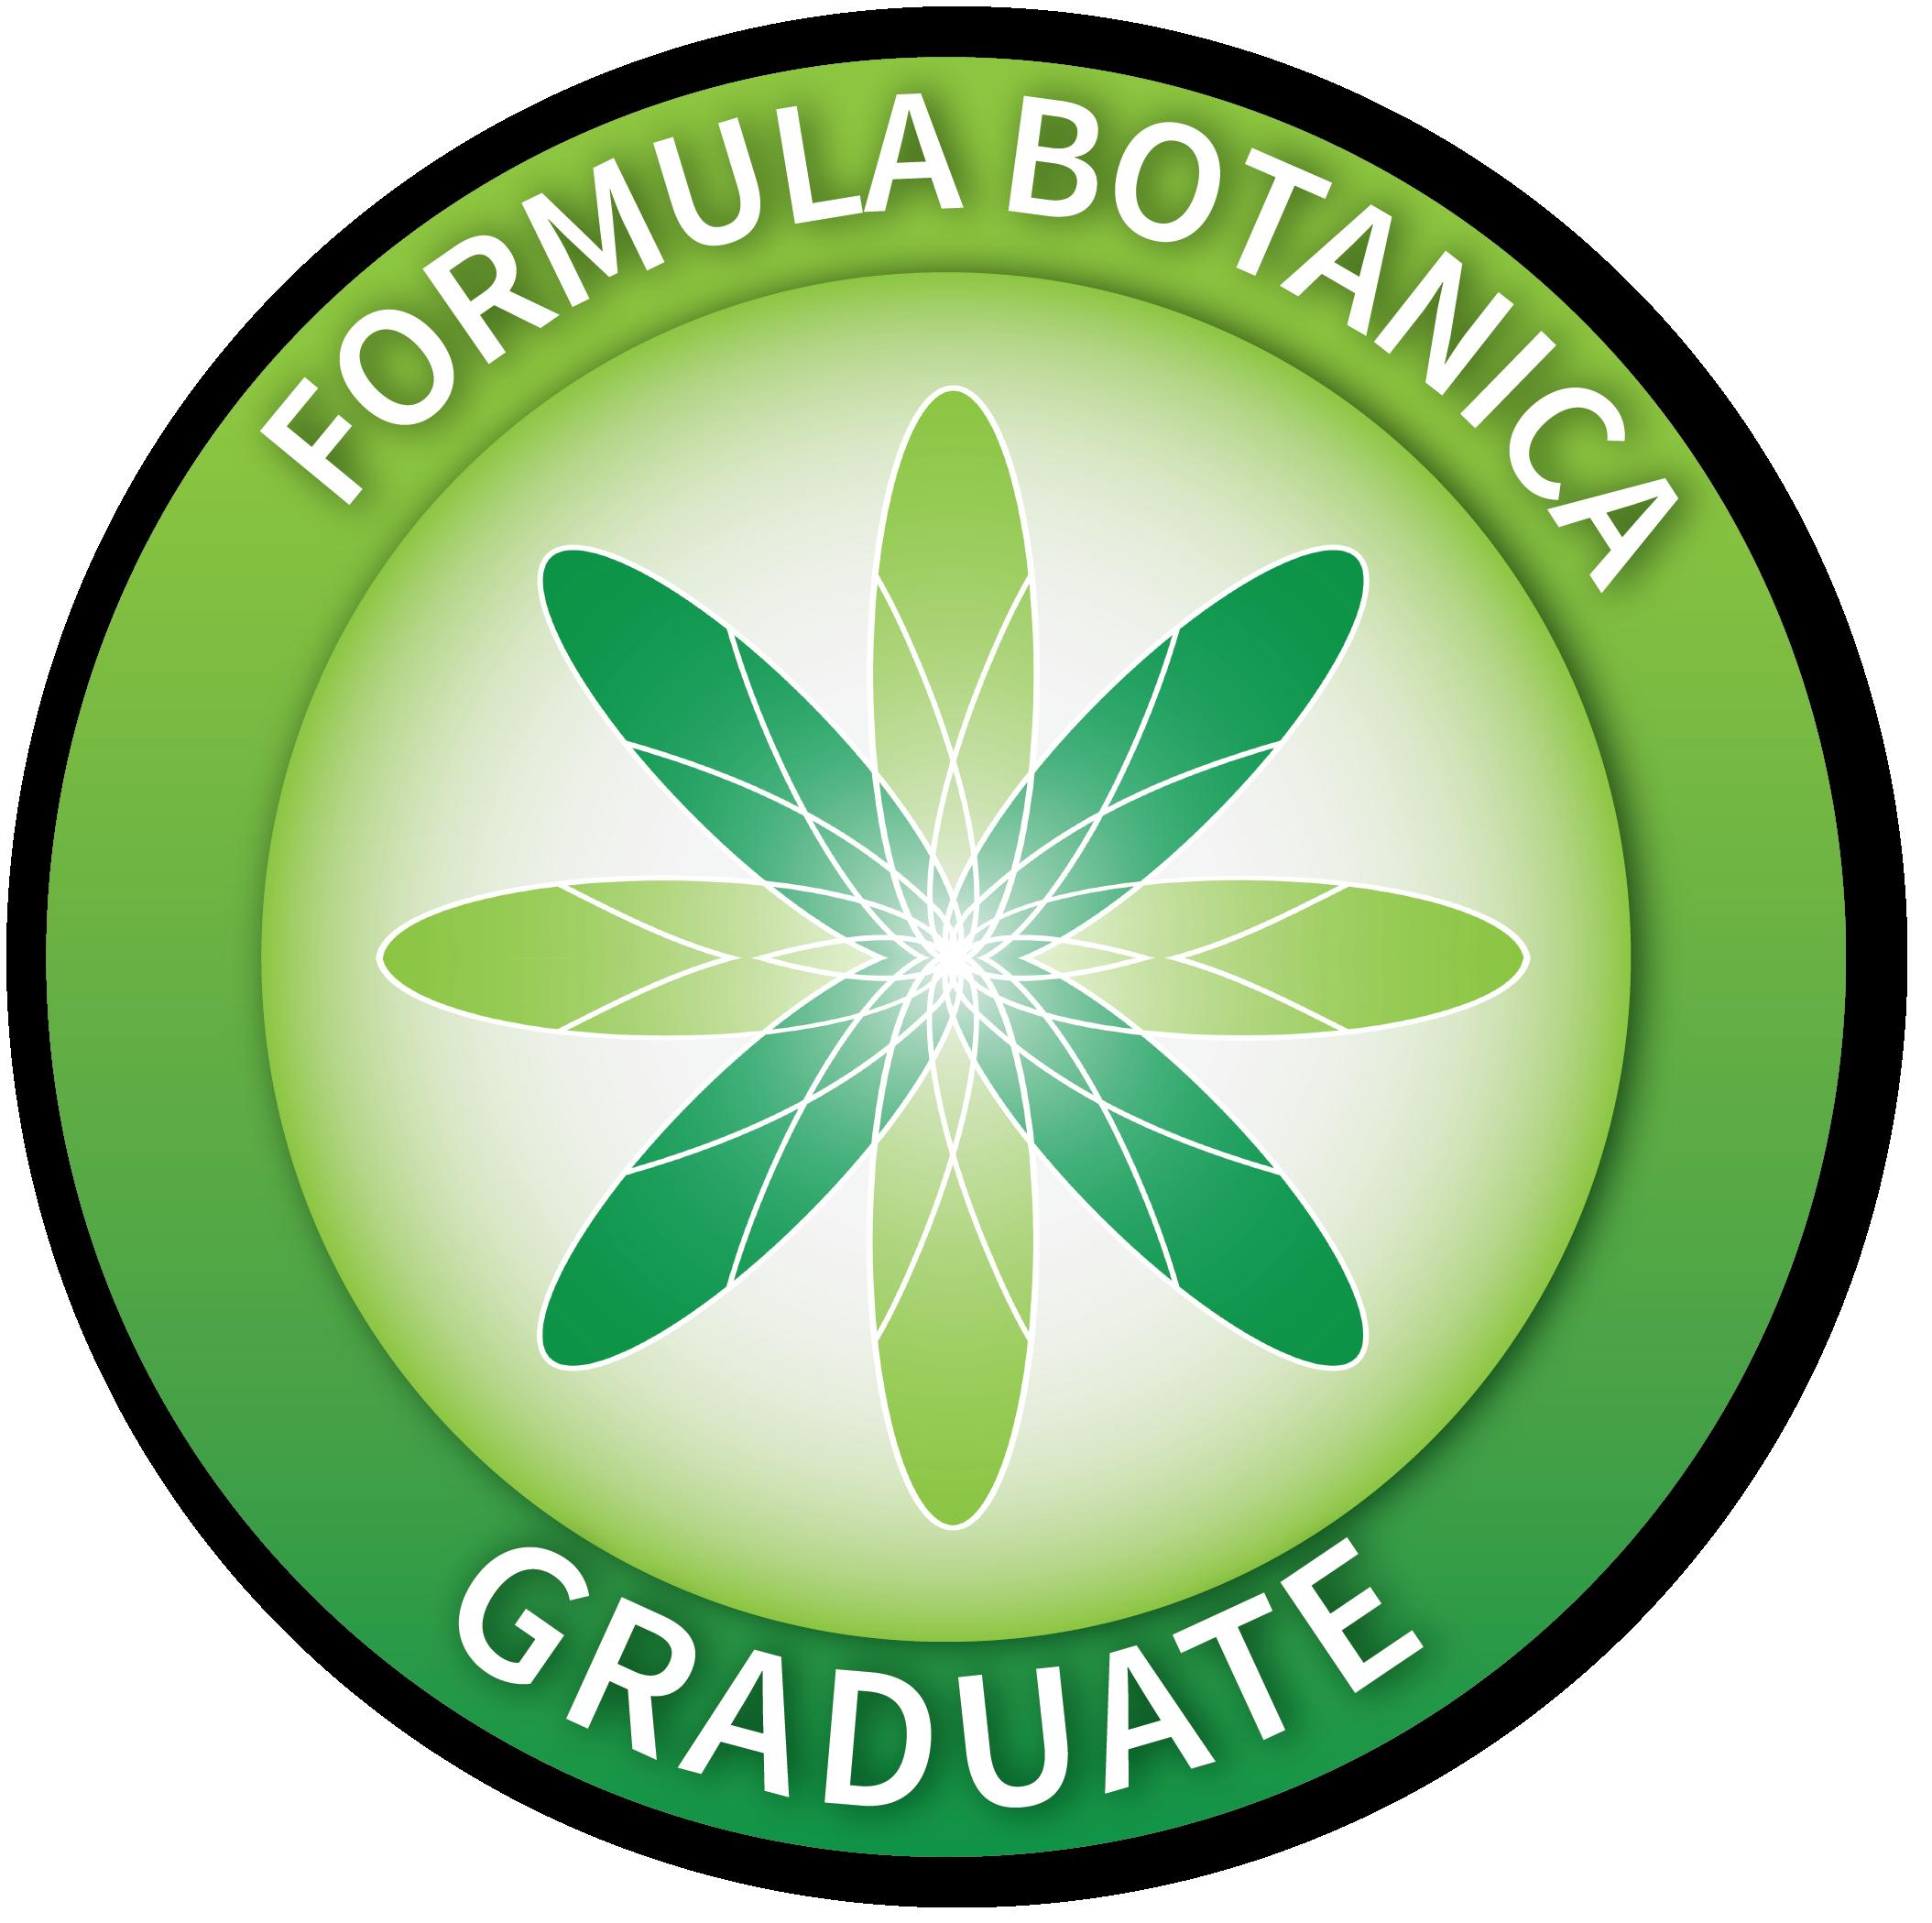 Formula Botanica Graduate